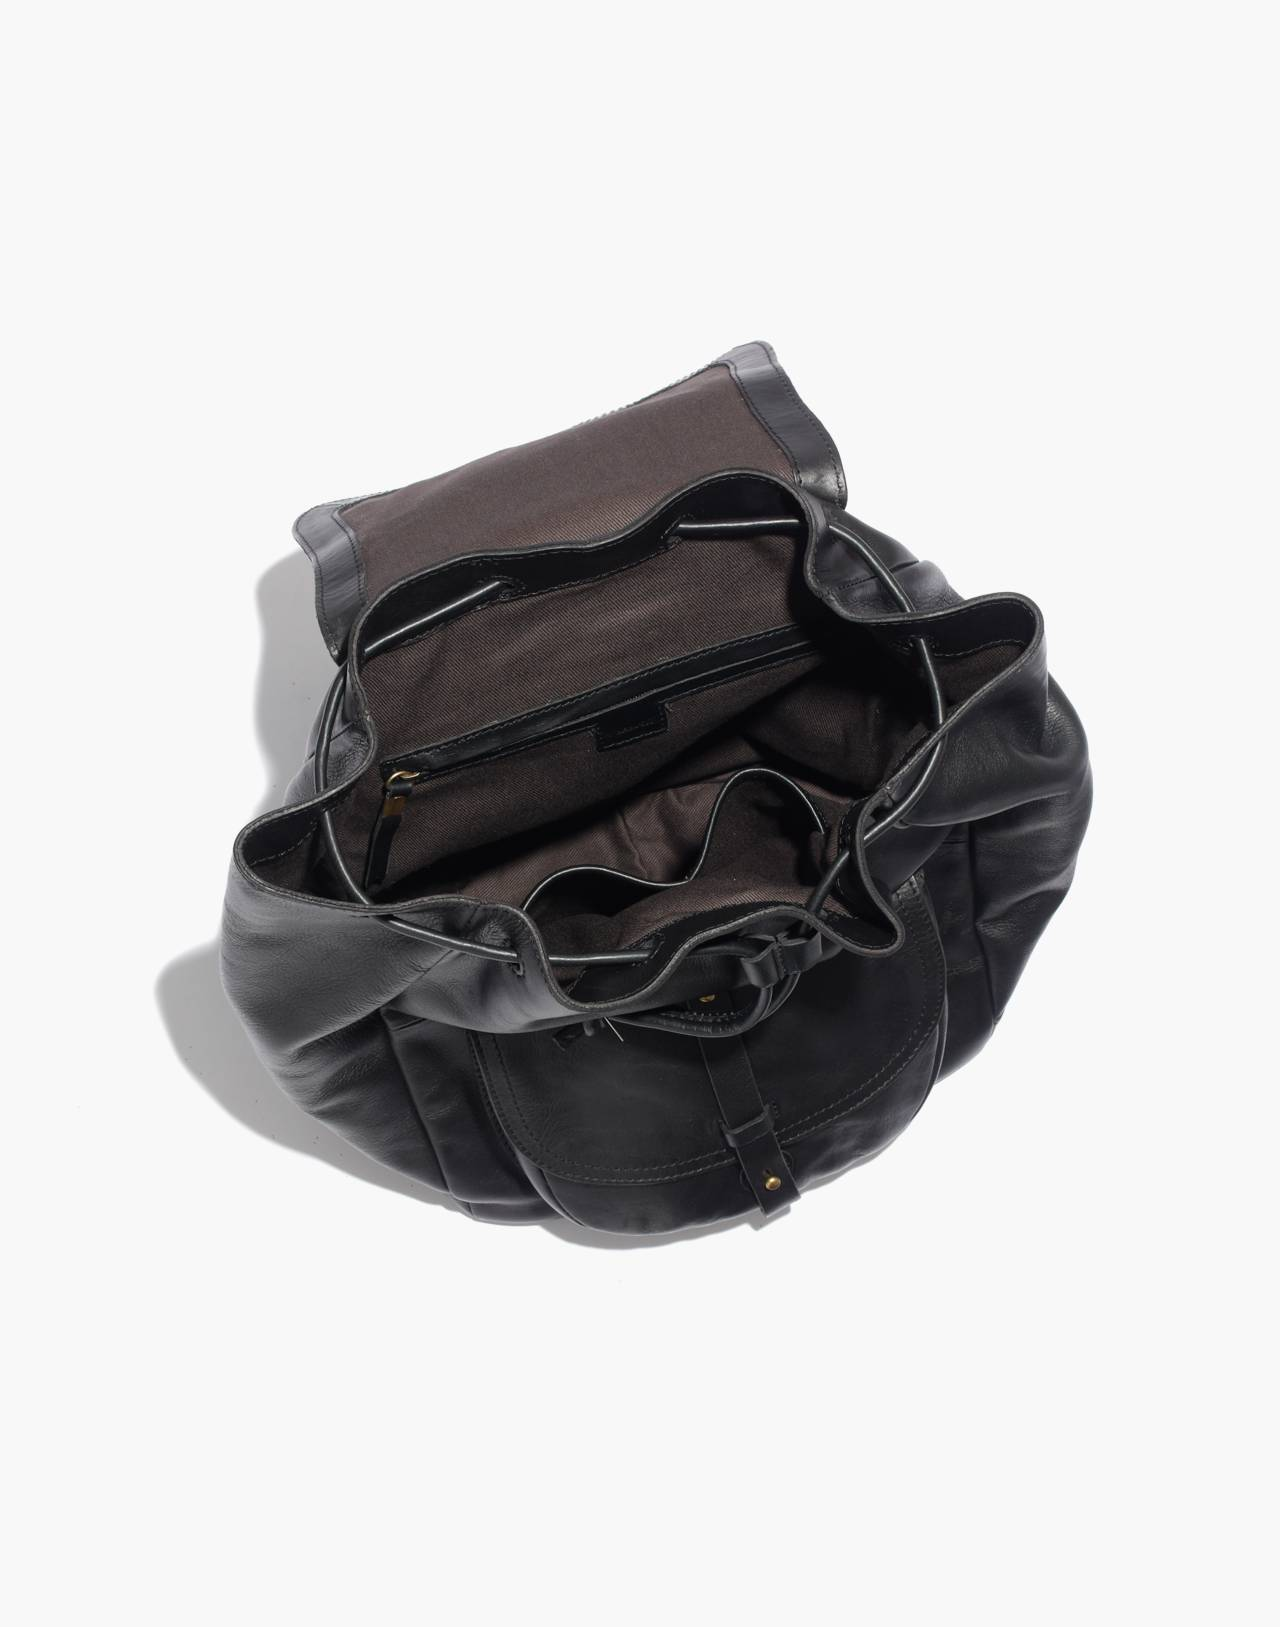 The Transport Rucksack in true black image 3